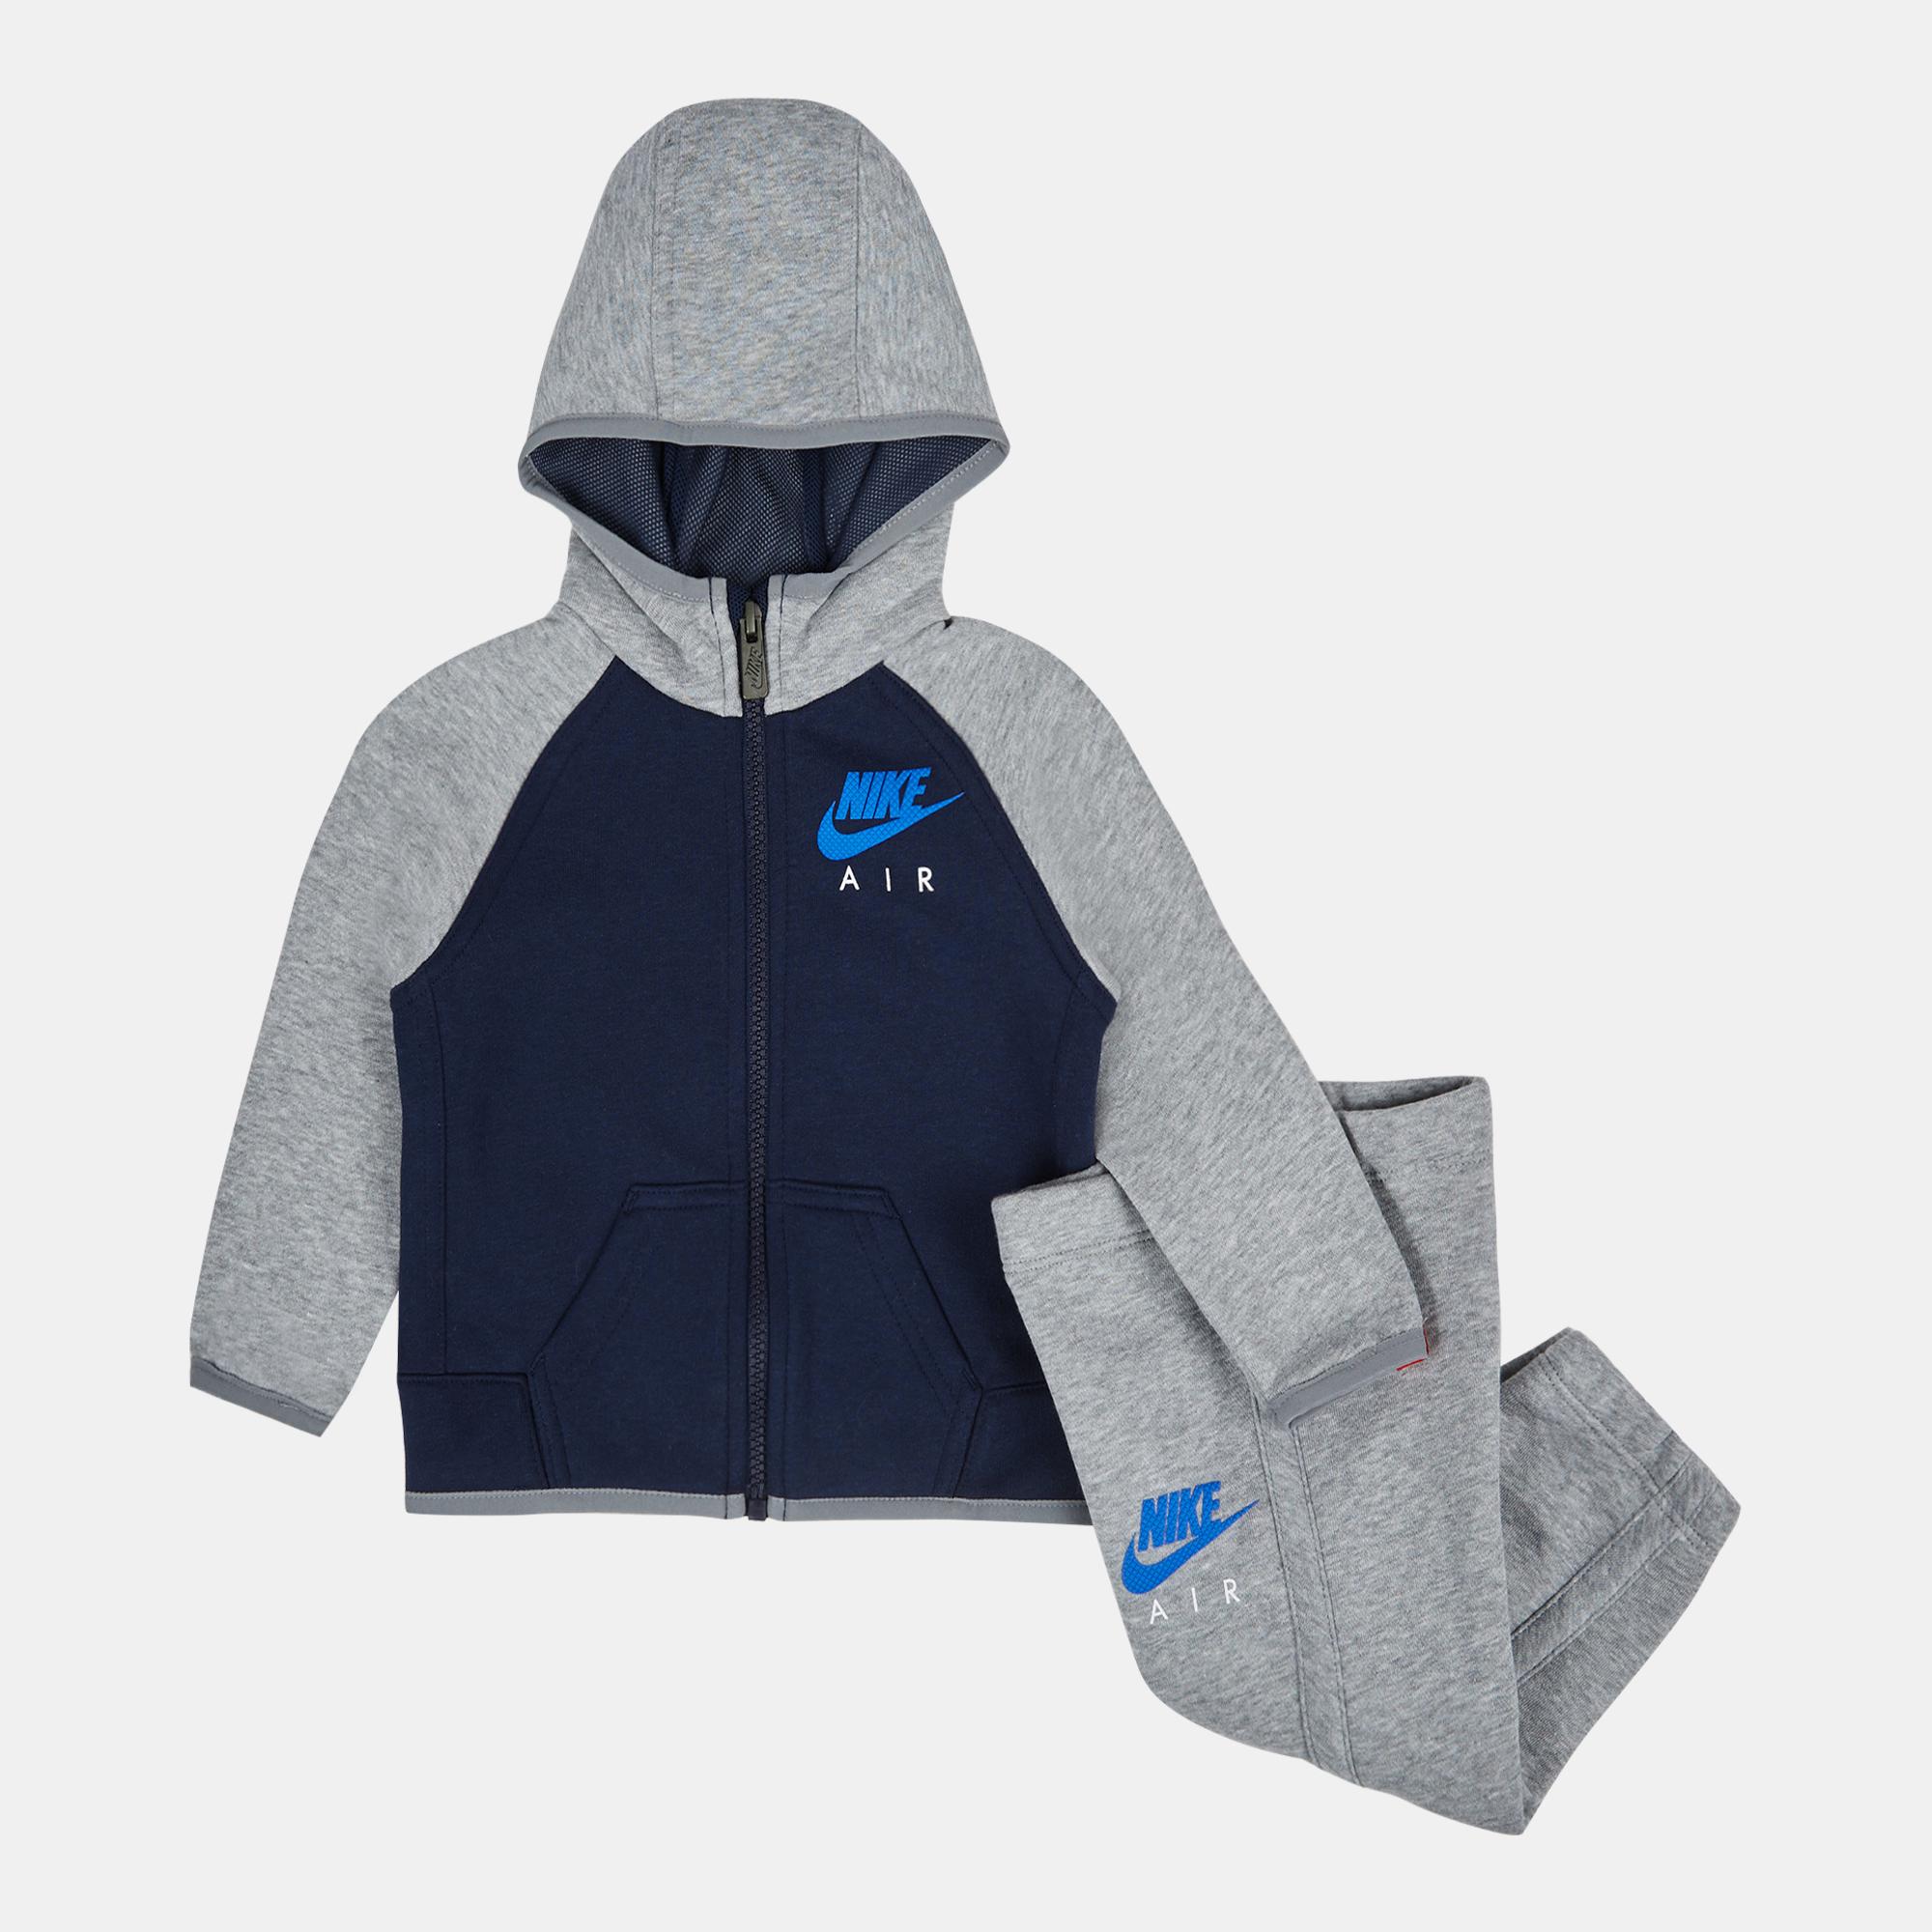 70c9636d9a12 Shop Blue Nike Kids  HBR Brushed Fleece Tracksuit for Kids by Nike